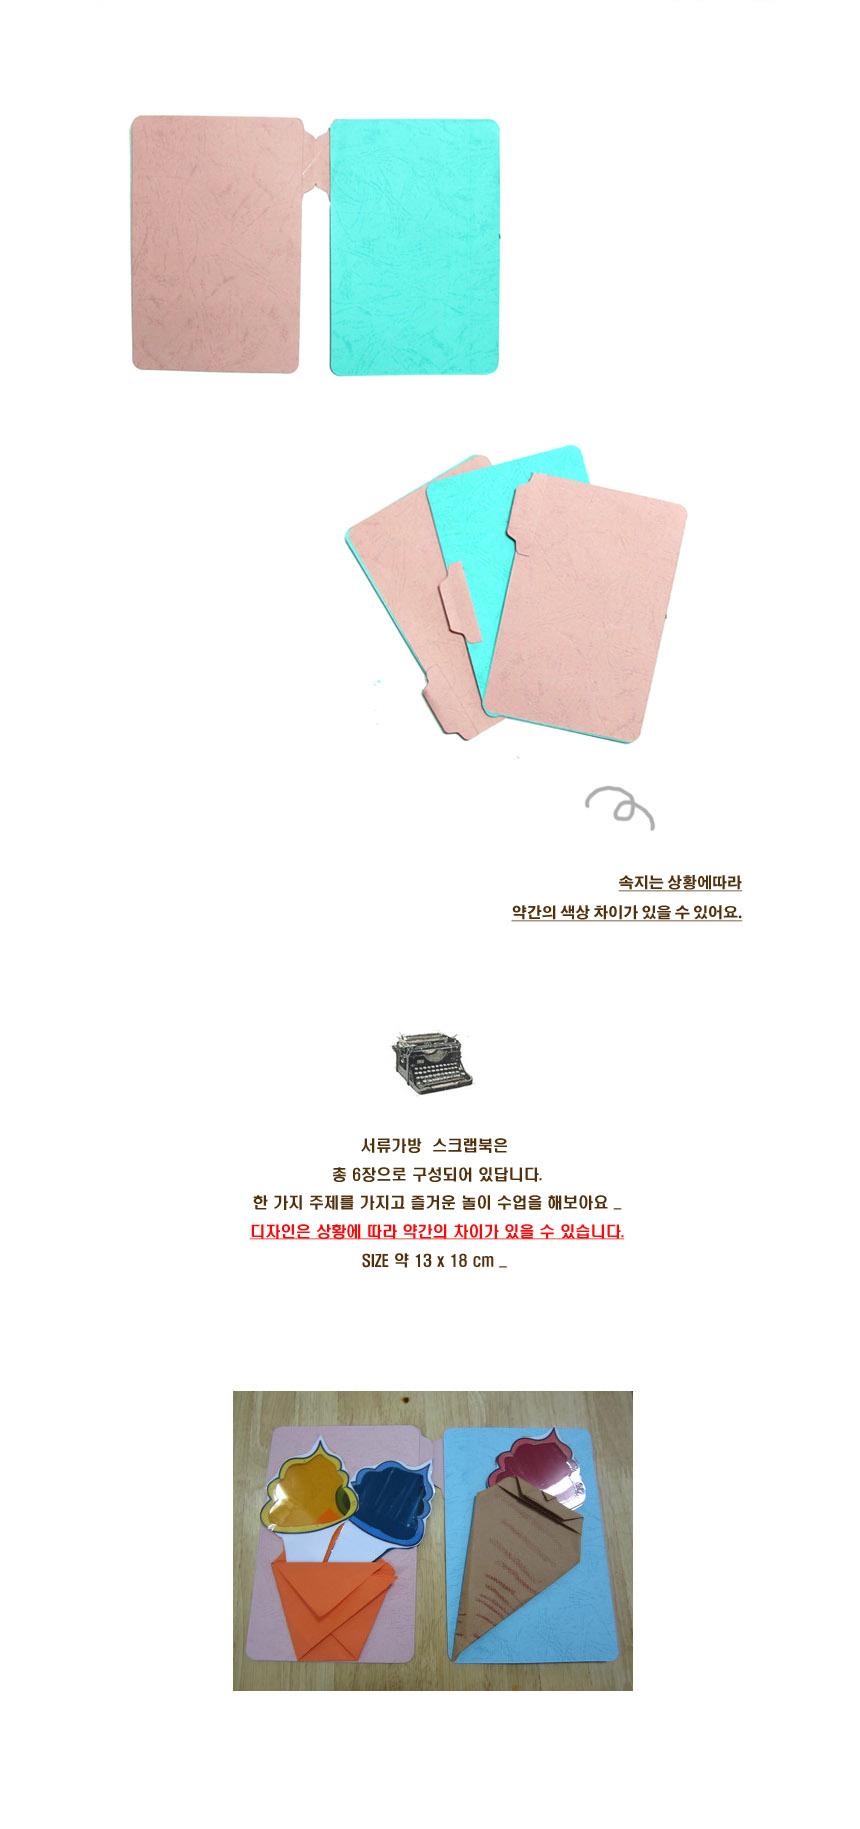 [KC인증]서류가방  - 스크랩북 - 만꾸(만들기와 꾸미기), 2,800원, 종이공예/북아트, 북아트 재료